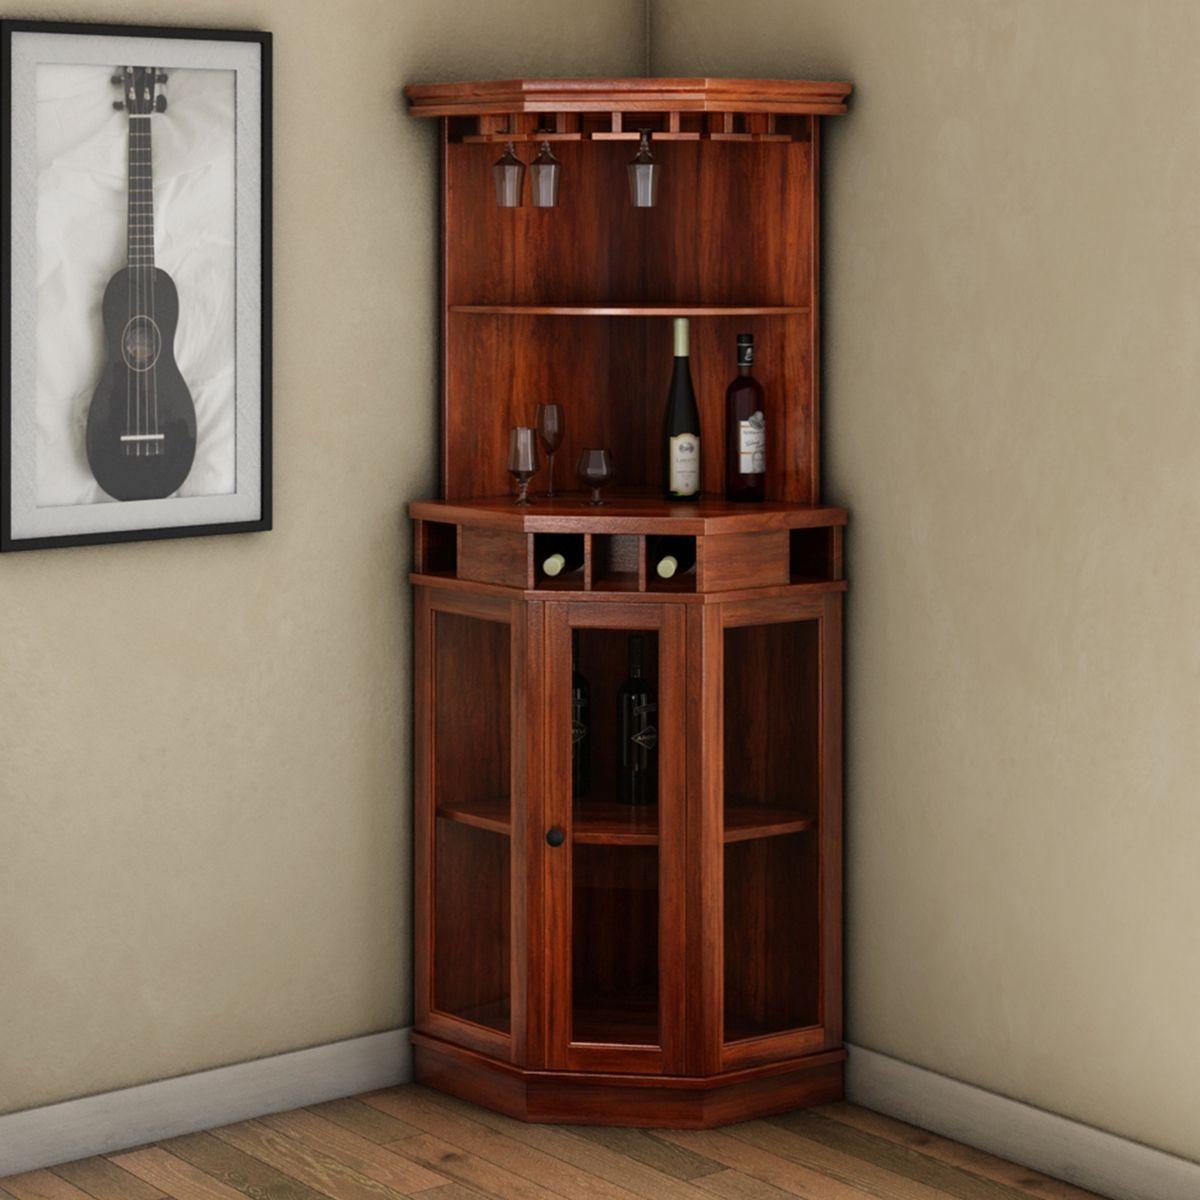 Pin By Hemambika Hariharan On Furnishing Ideas In 2020 Corner Wine Cabinet Wine Bar Cabinet Corner Liquor Cabinet